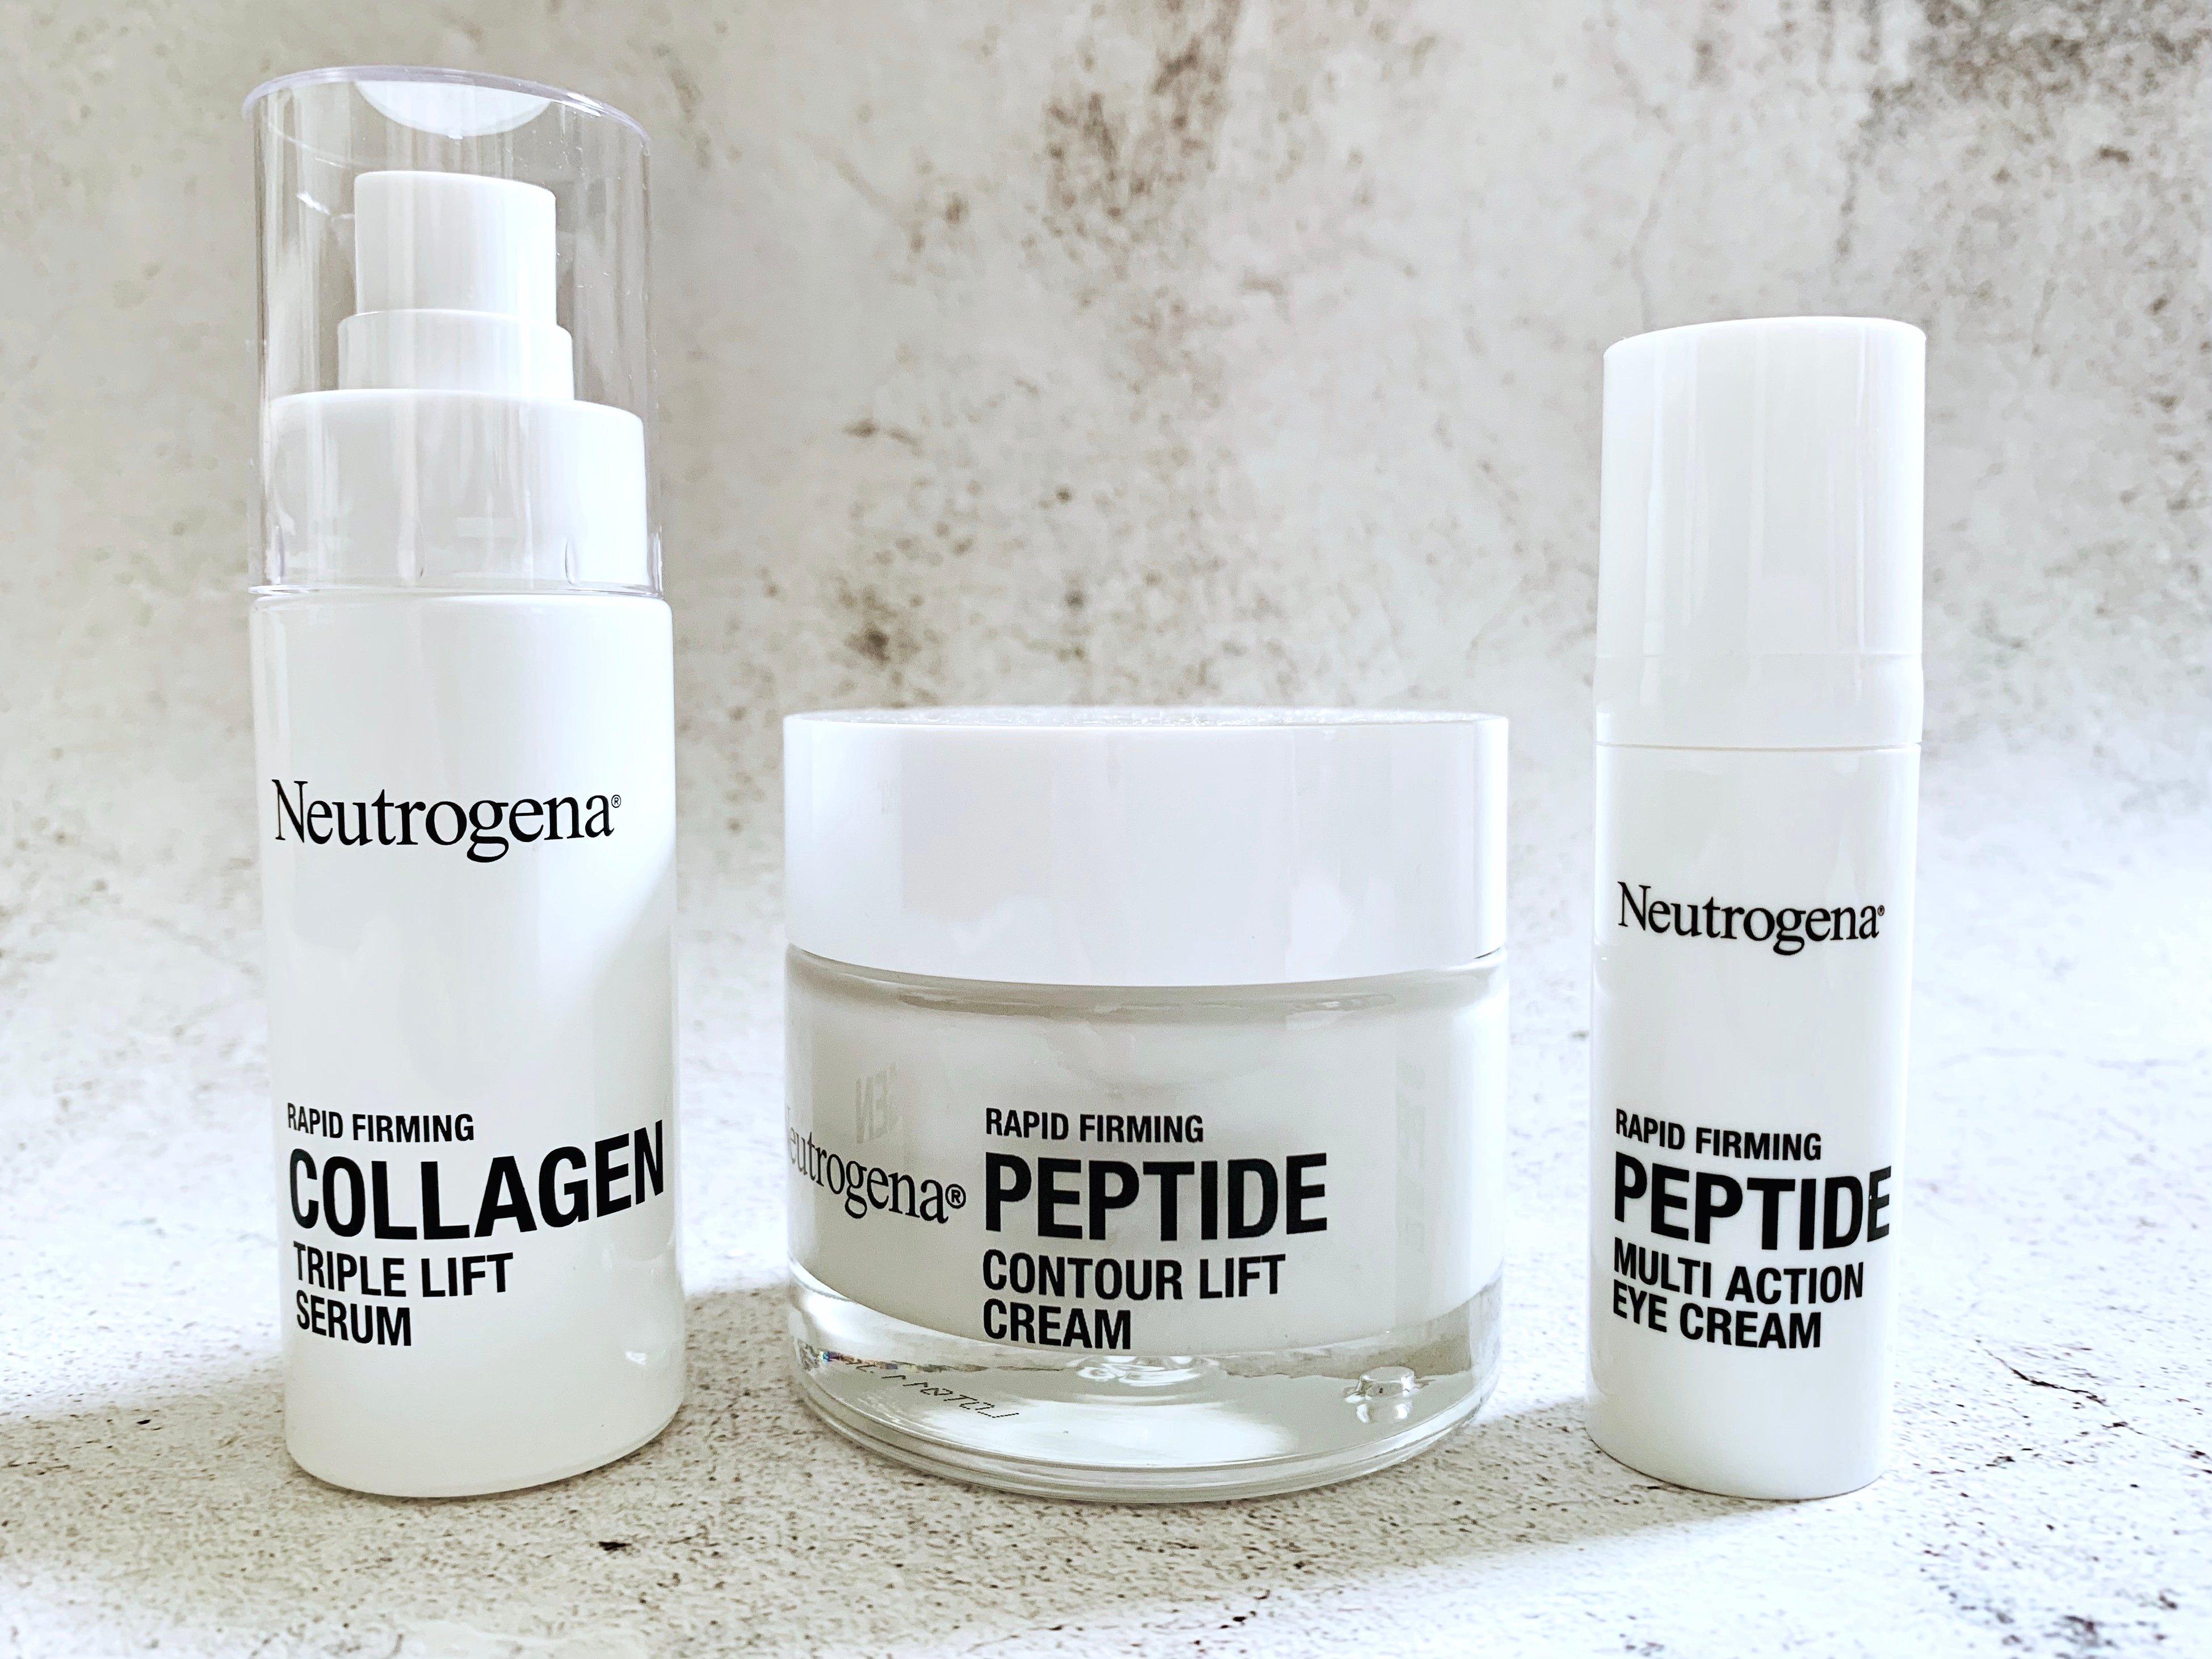 Neutrogena Rapid Firming Collagen Triple Lift Face Serum, Peptide Multi Action Eye Cream and Peptide Contour Lift Cream